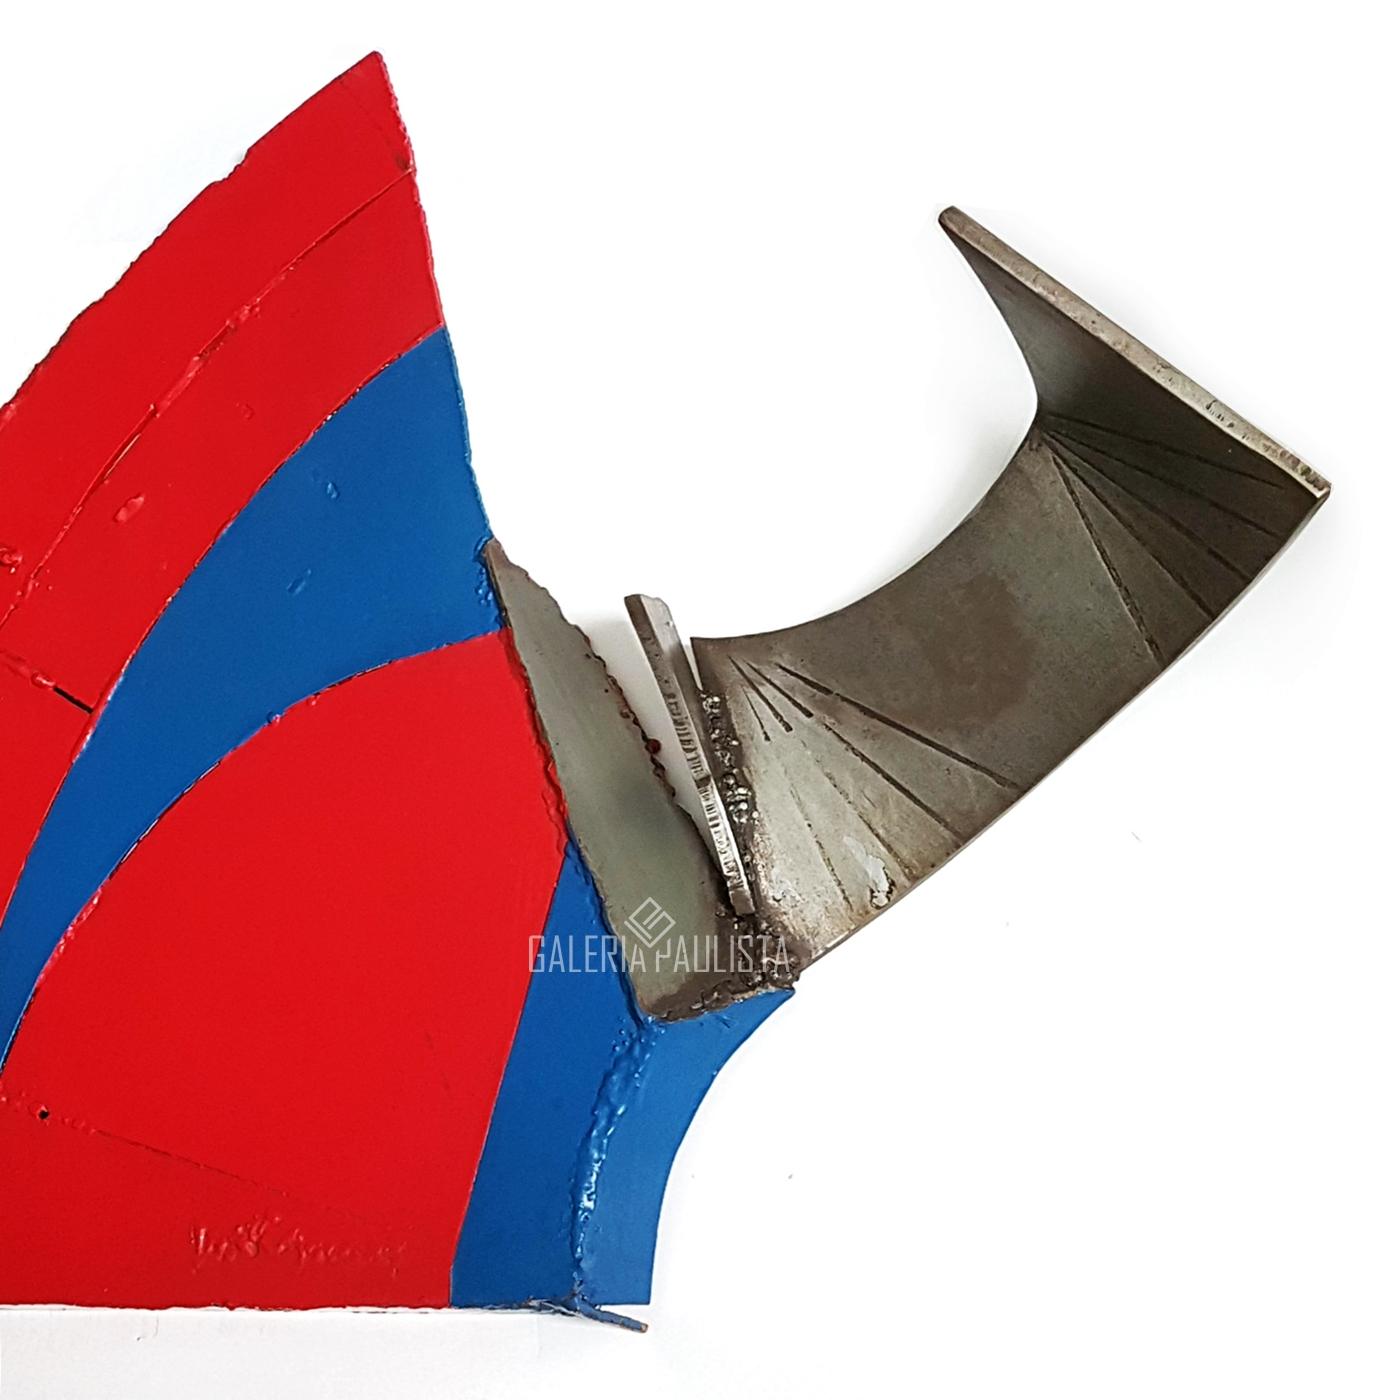 GP-PE11050-Caciporé-Torres-Buterfly-Escultura-Aço-Galeria-Paulista-c